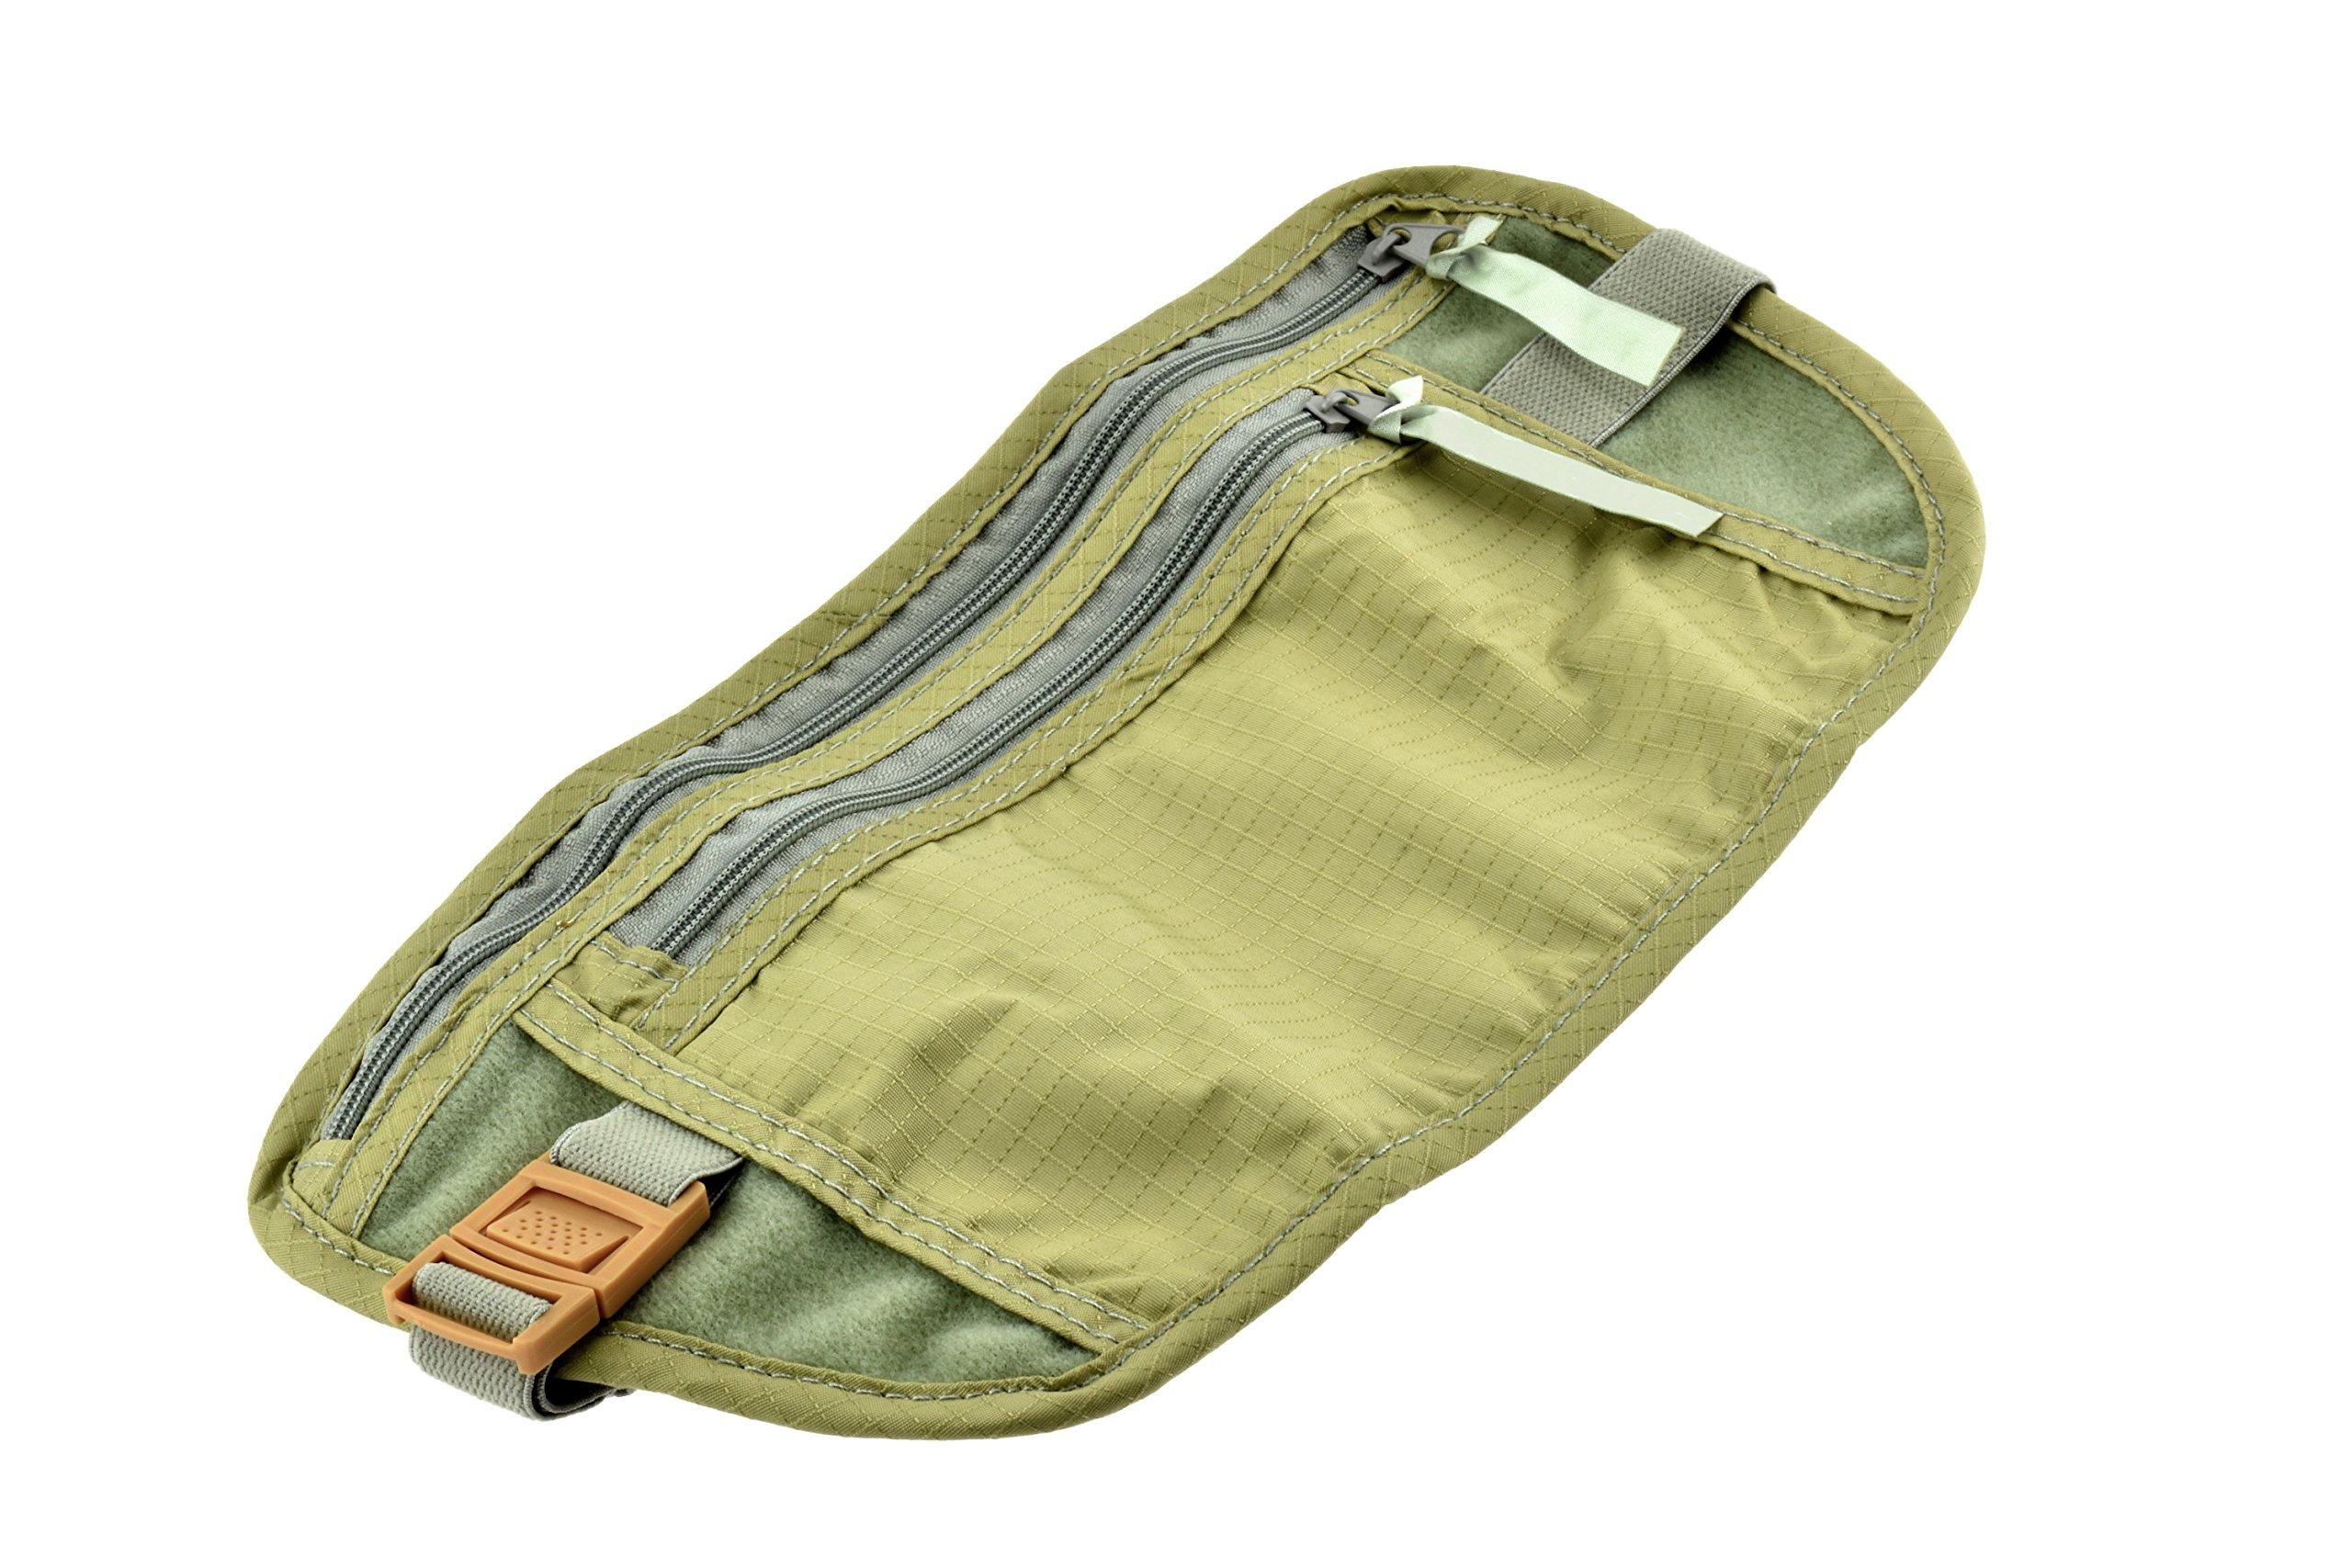 SE TP101-POUCH Concealed Dual Zipper Travel Pouch by SE (Image #1)